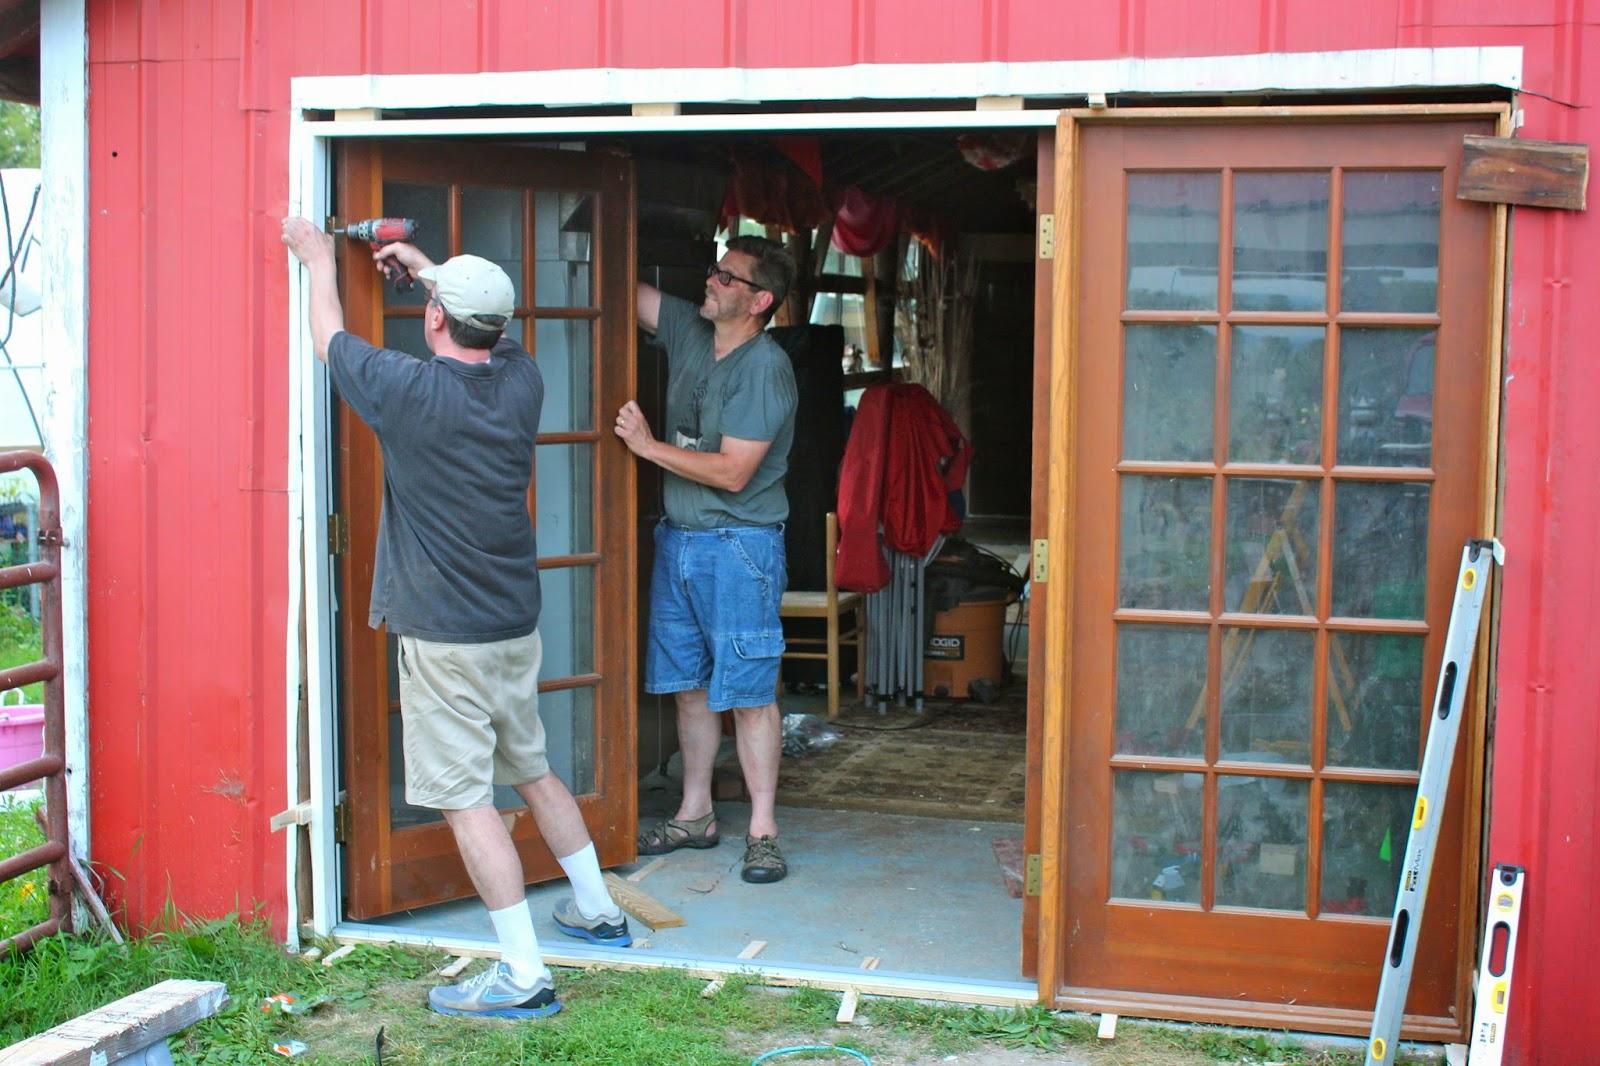 Squash Blossom Farm: Our Barn Doors are More Open!